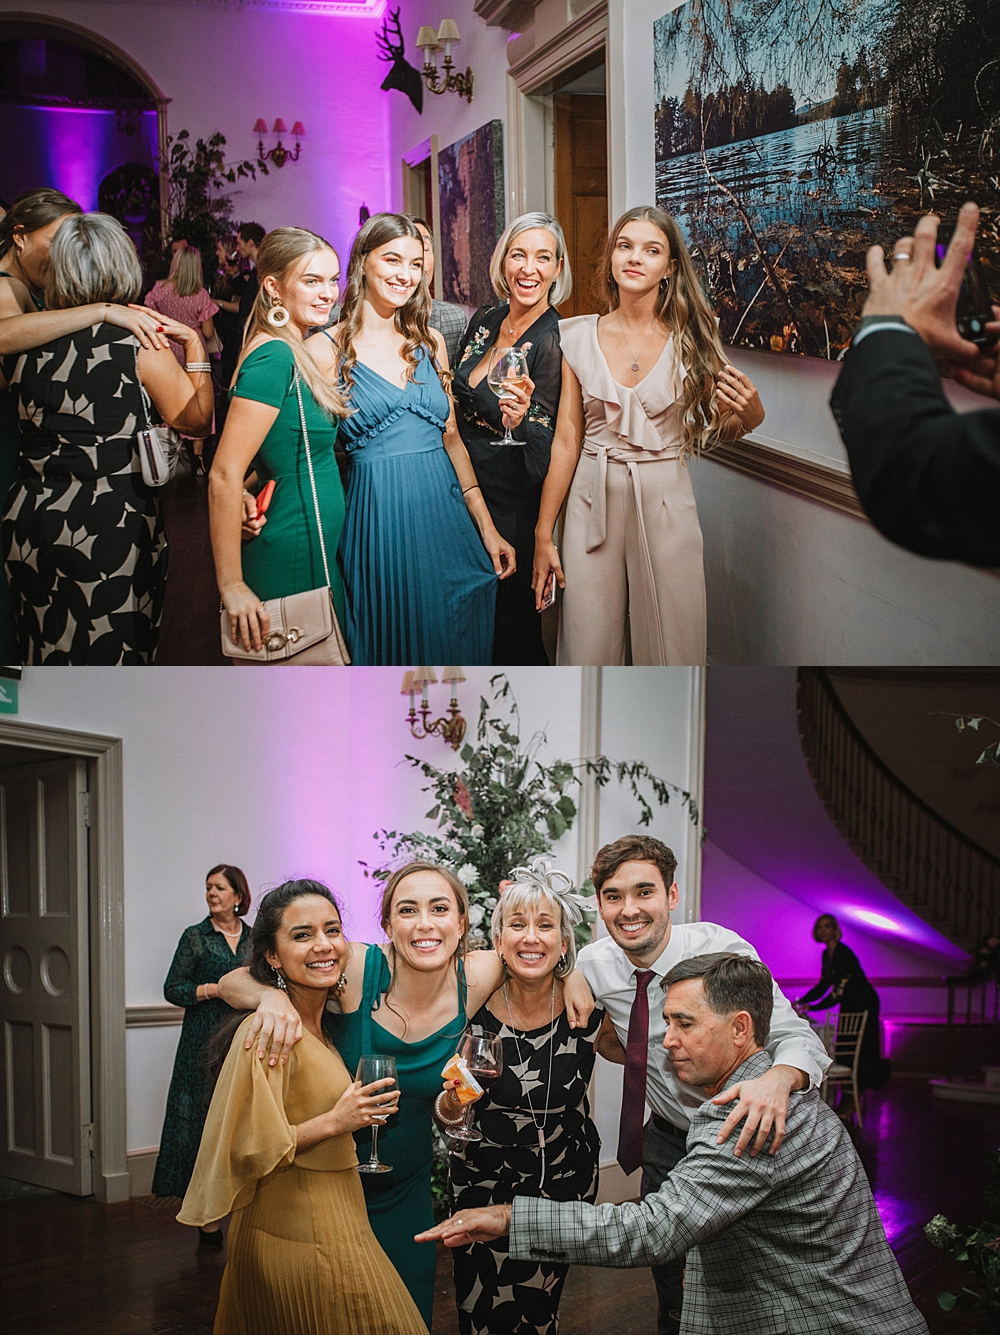 Fasque Castle wedding,The Gibsons,elegant wedding photographers glasgow,light and airy wedding photographers glasgow,natural wedding photographers,romantic photographers Scotland,soft wedding photographers,two wedding photographers scotland,weekday wedding Scotland,